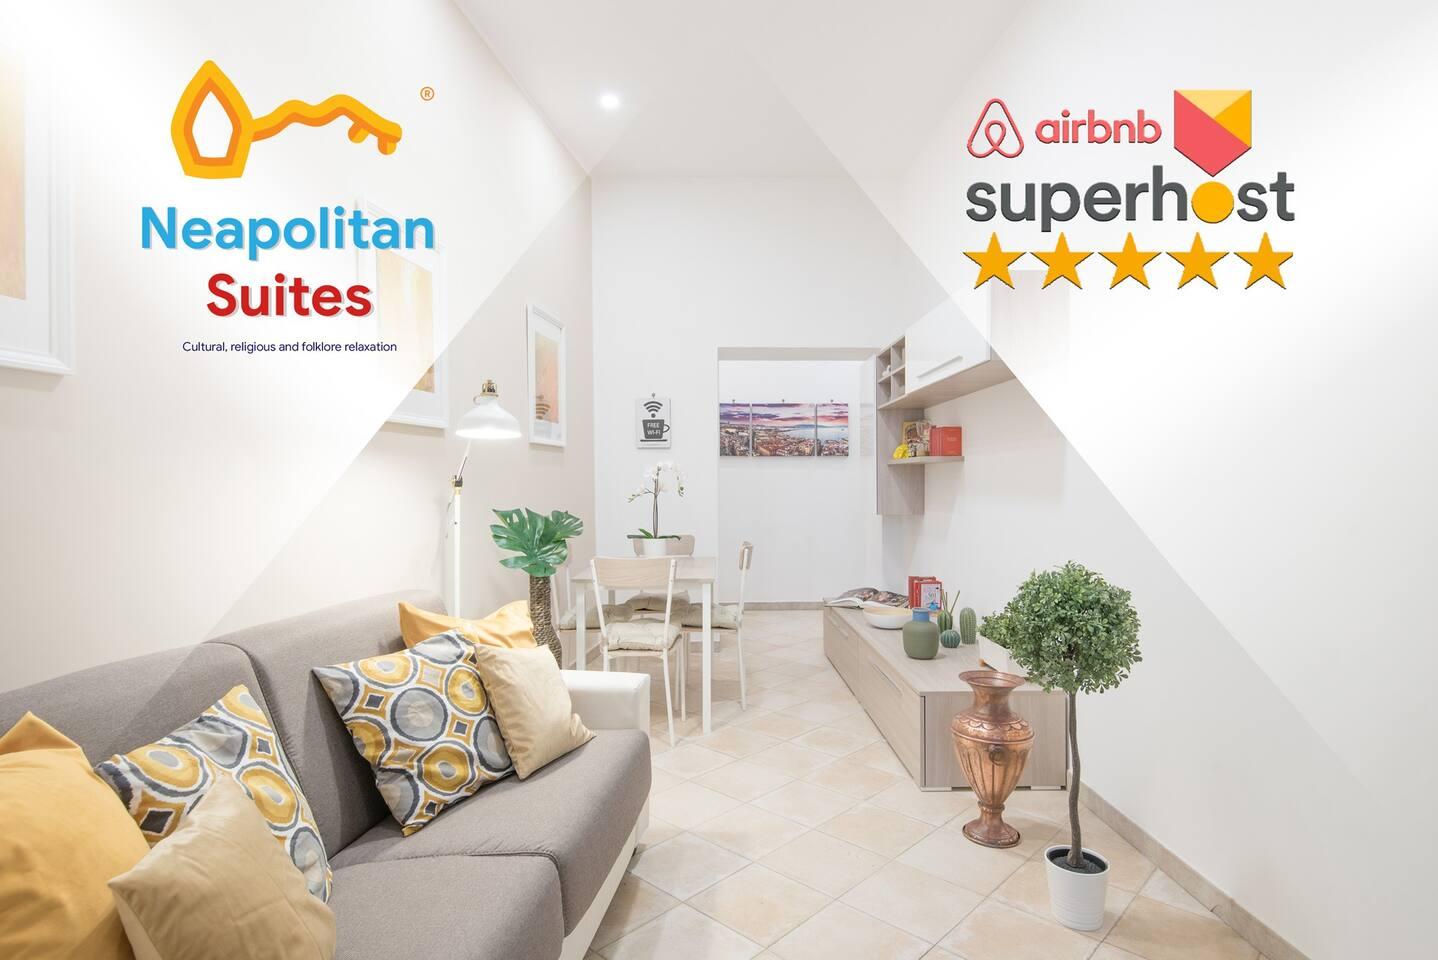 Neapolitan Suites Superhost